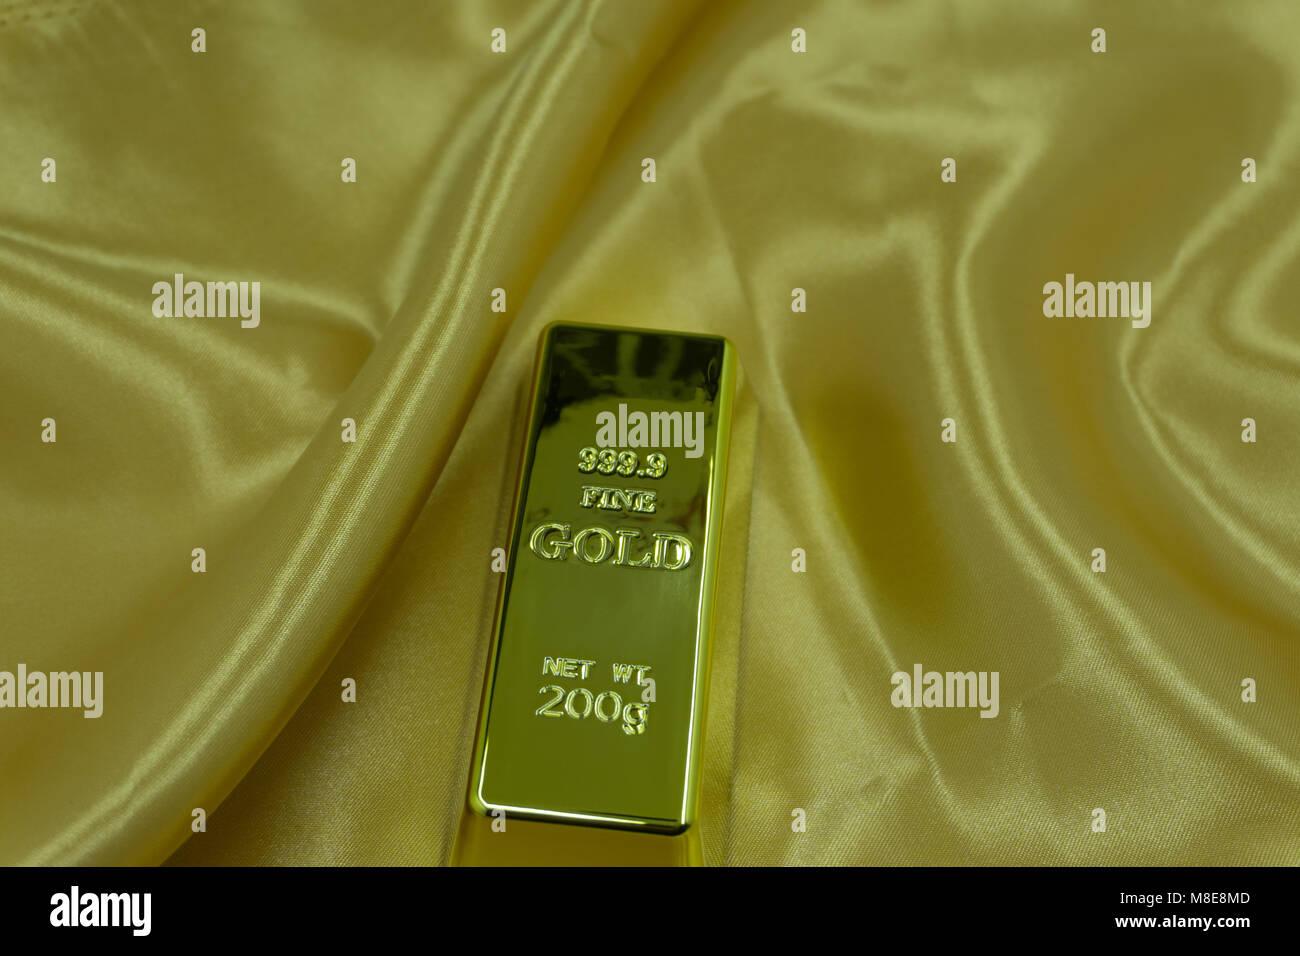 gold on a gold ingot , - Stock Image